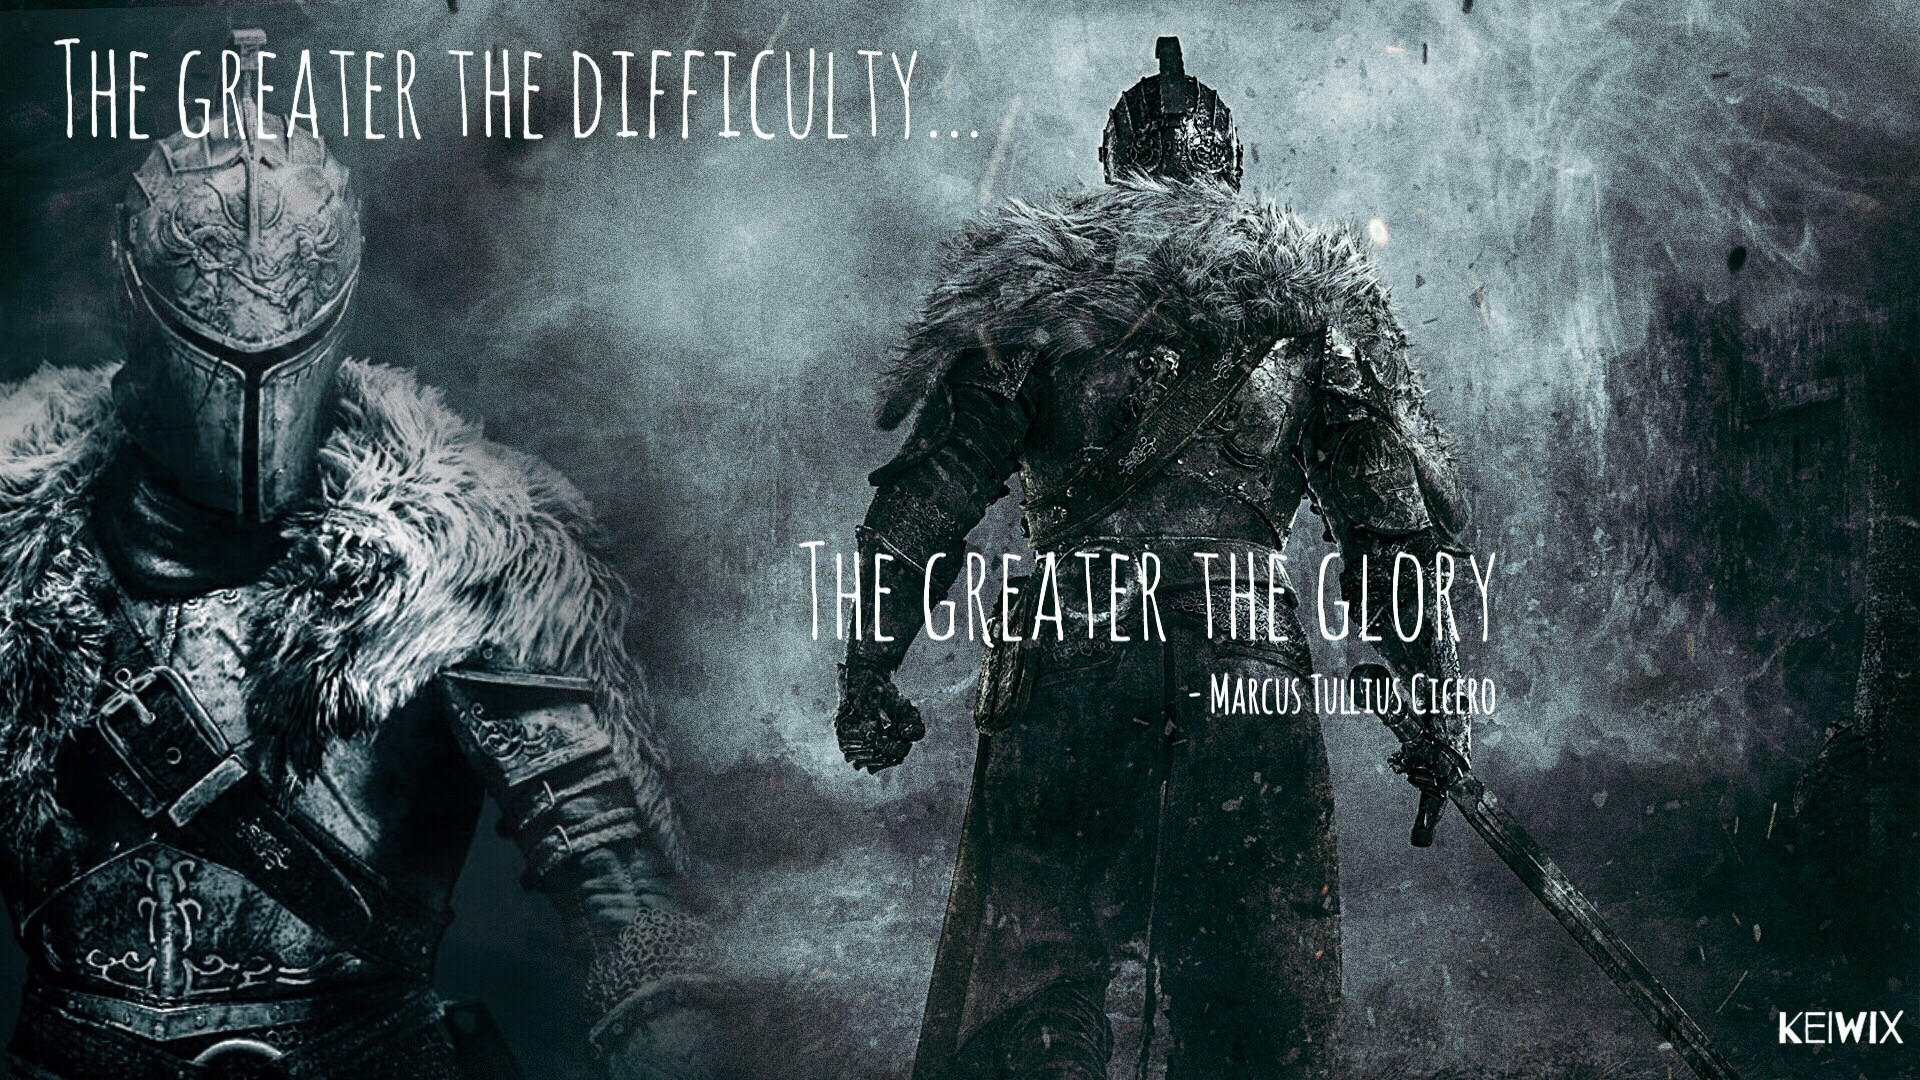 Dark Souls 2 Wallpaper By Keiwix On Deviantart